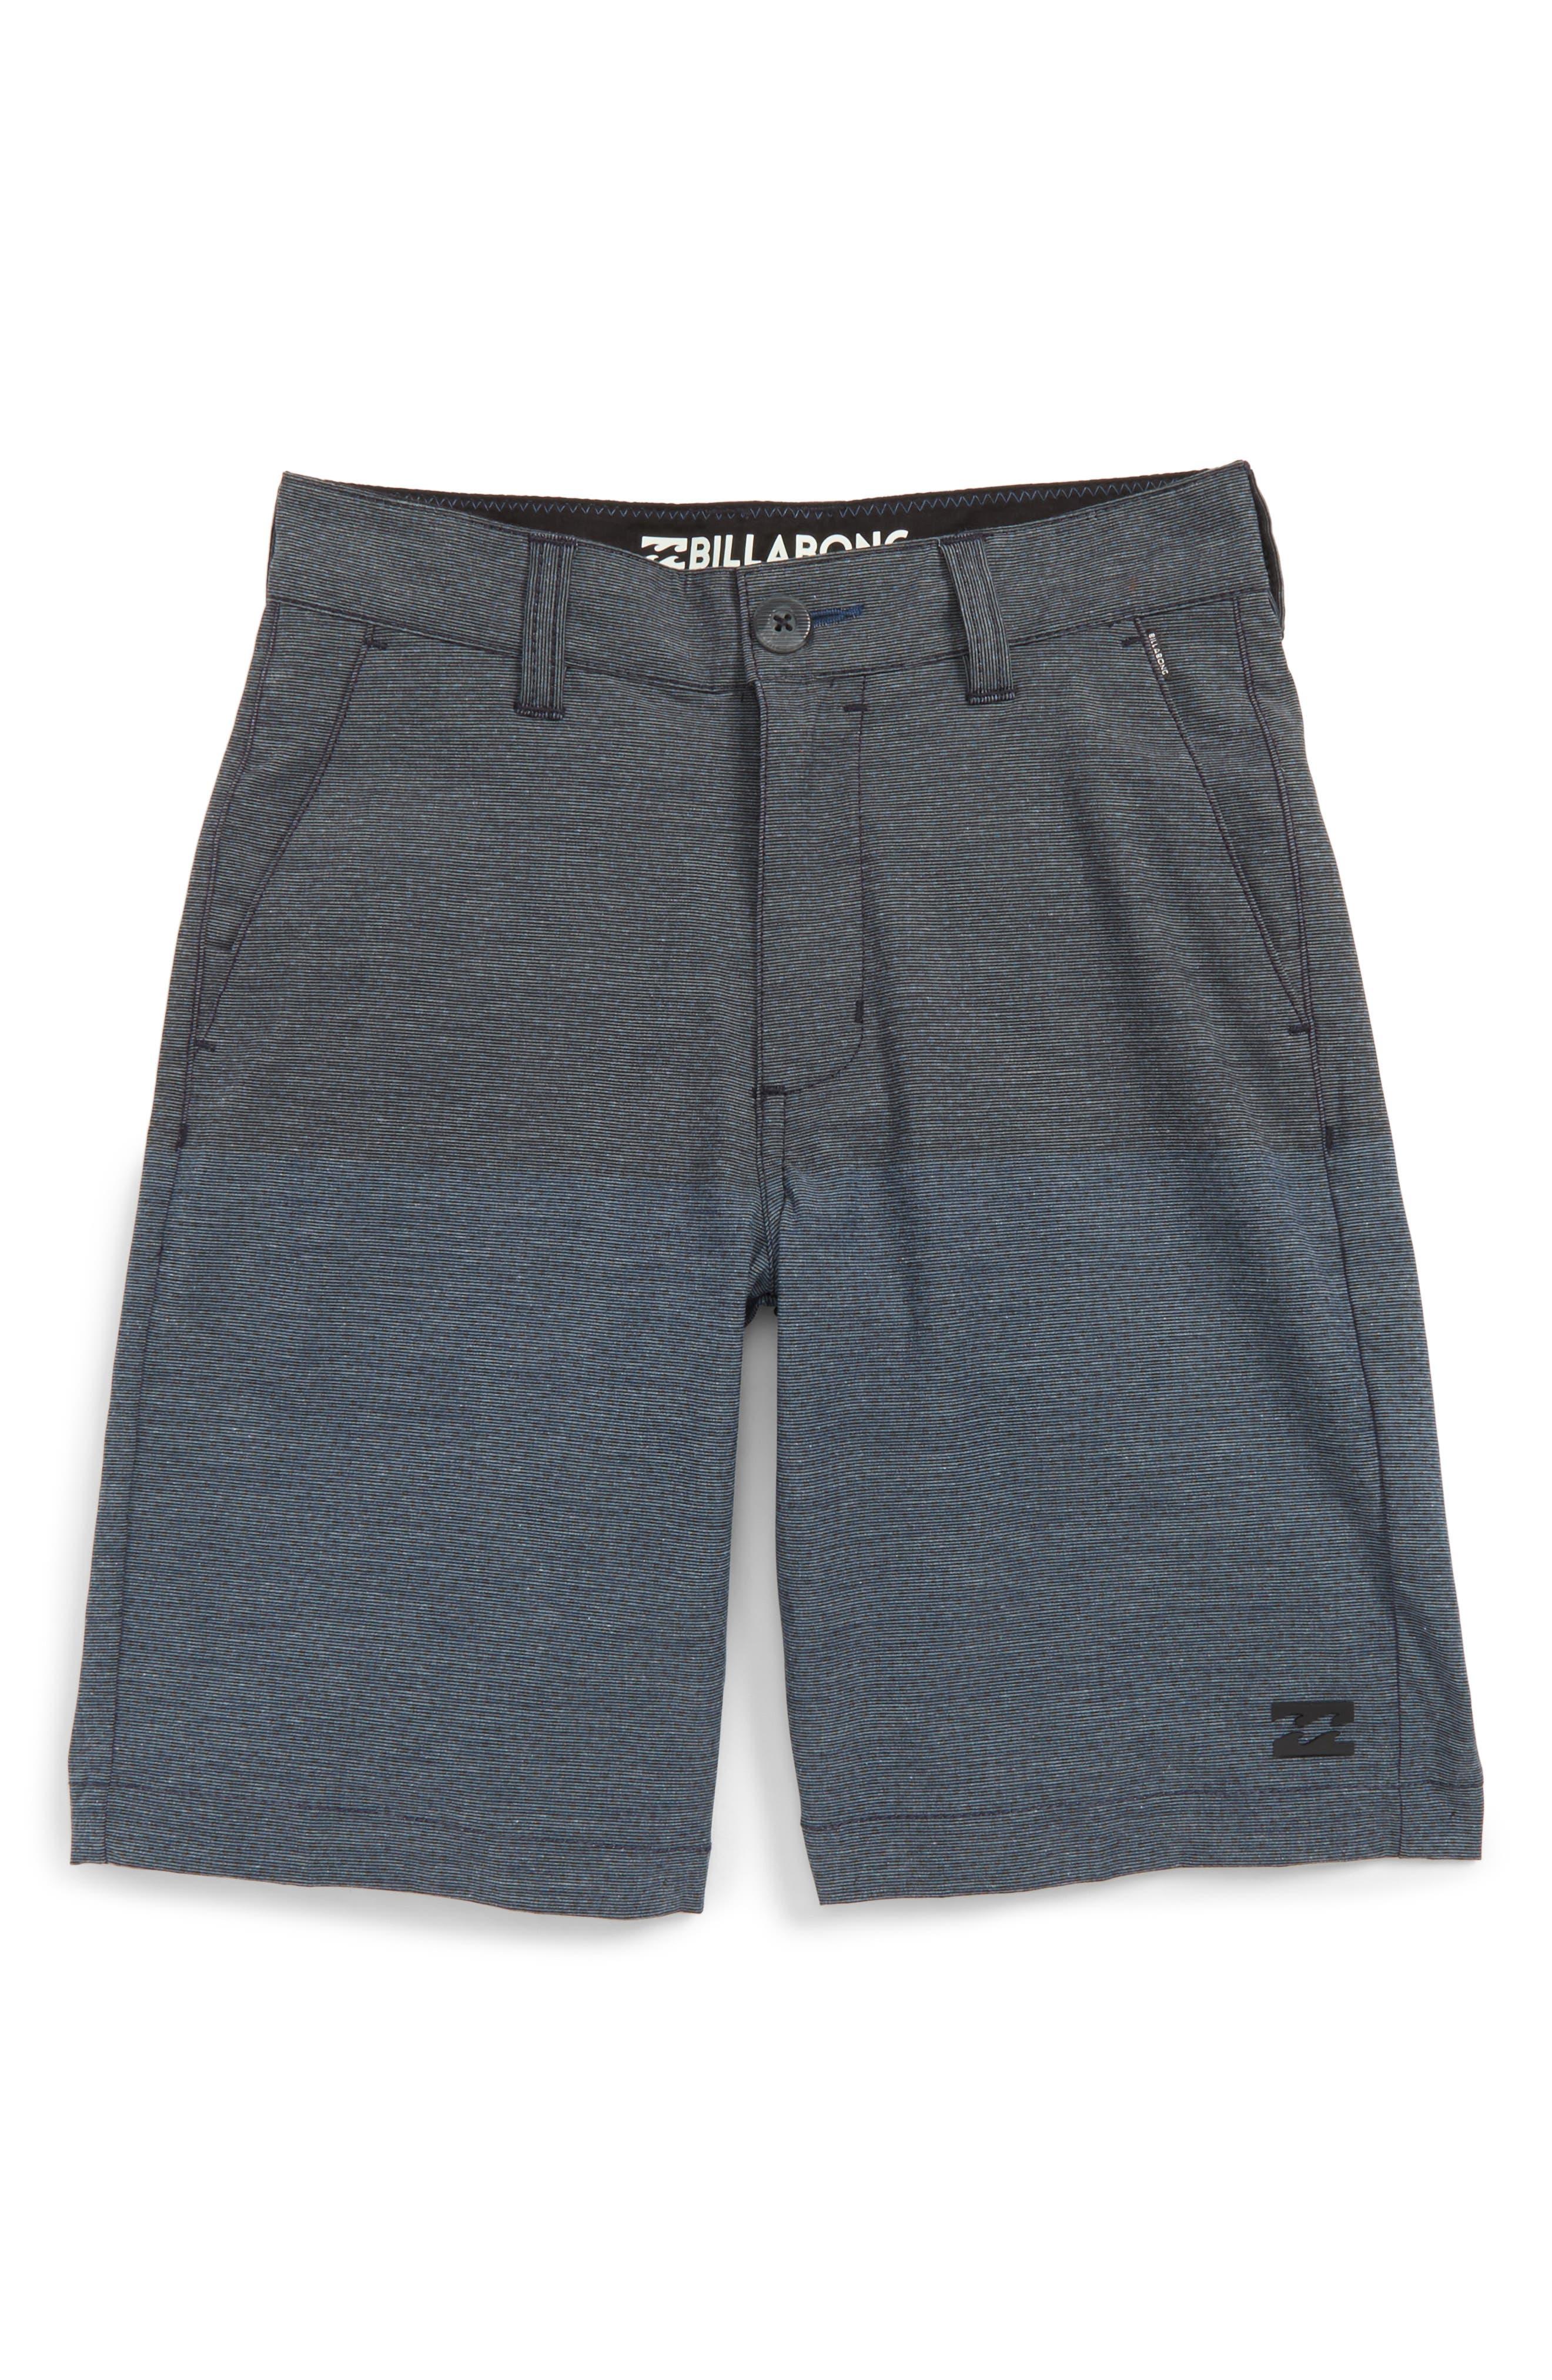 Billabong Crossfire X Line Up Hybrid Shorts (Big Boys)